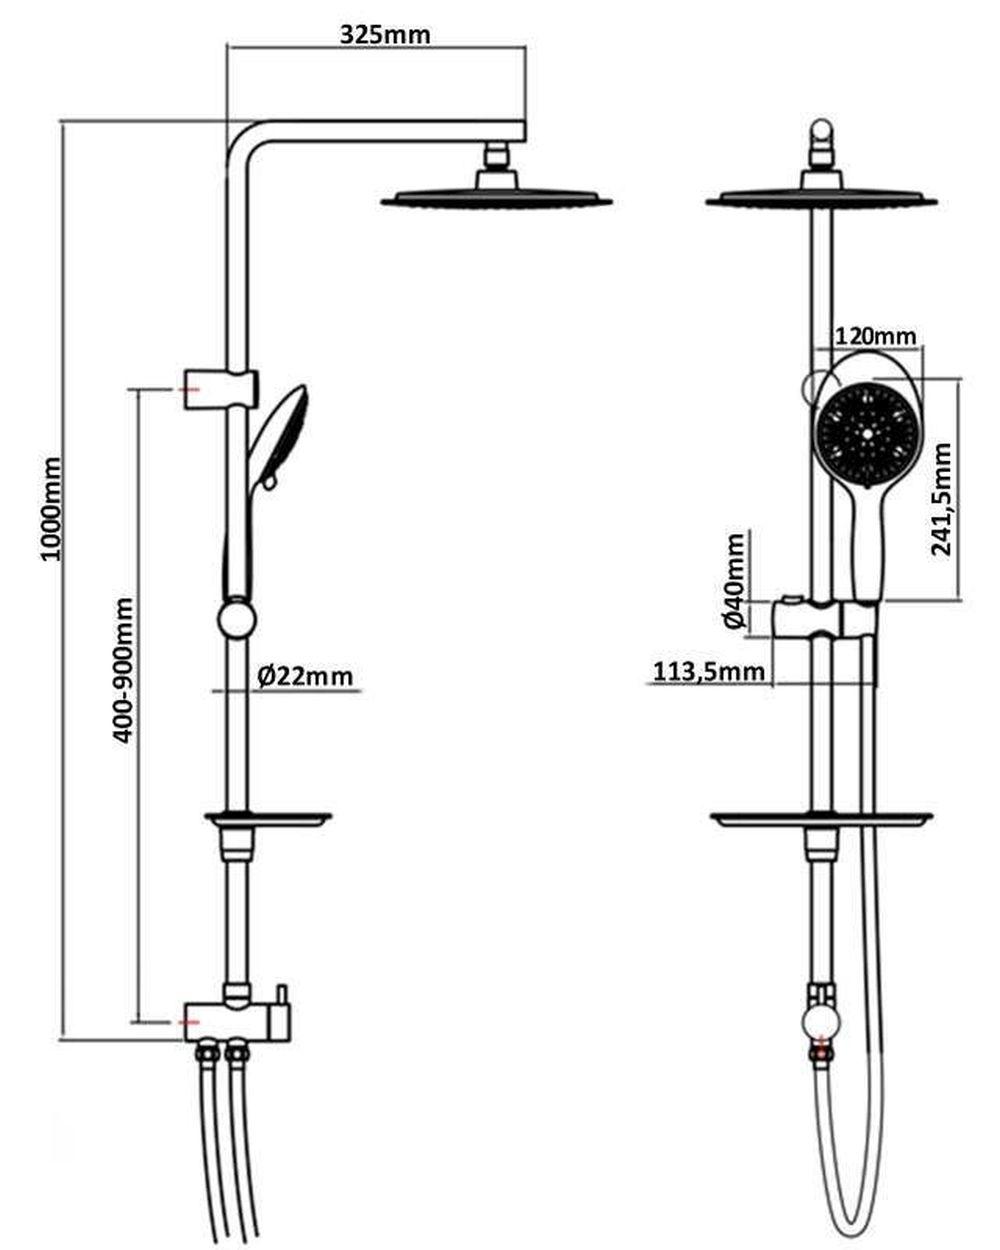 duschset duschkopf duschsystem brause duscharmatur regendusche duschstange chrom ebay. Black Bedroom Furniture Sets. Home Design Ideas